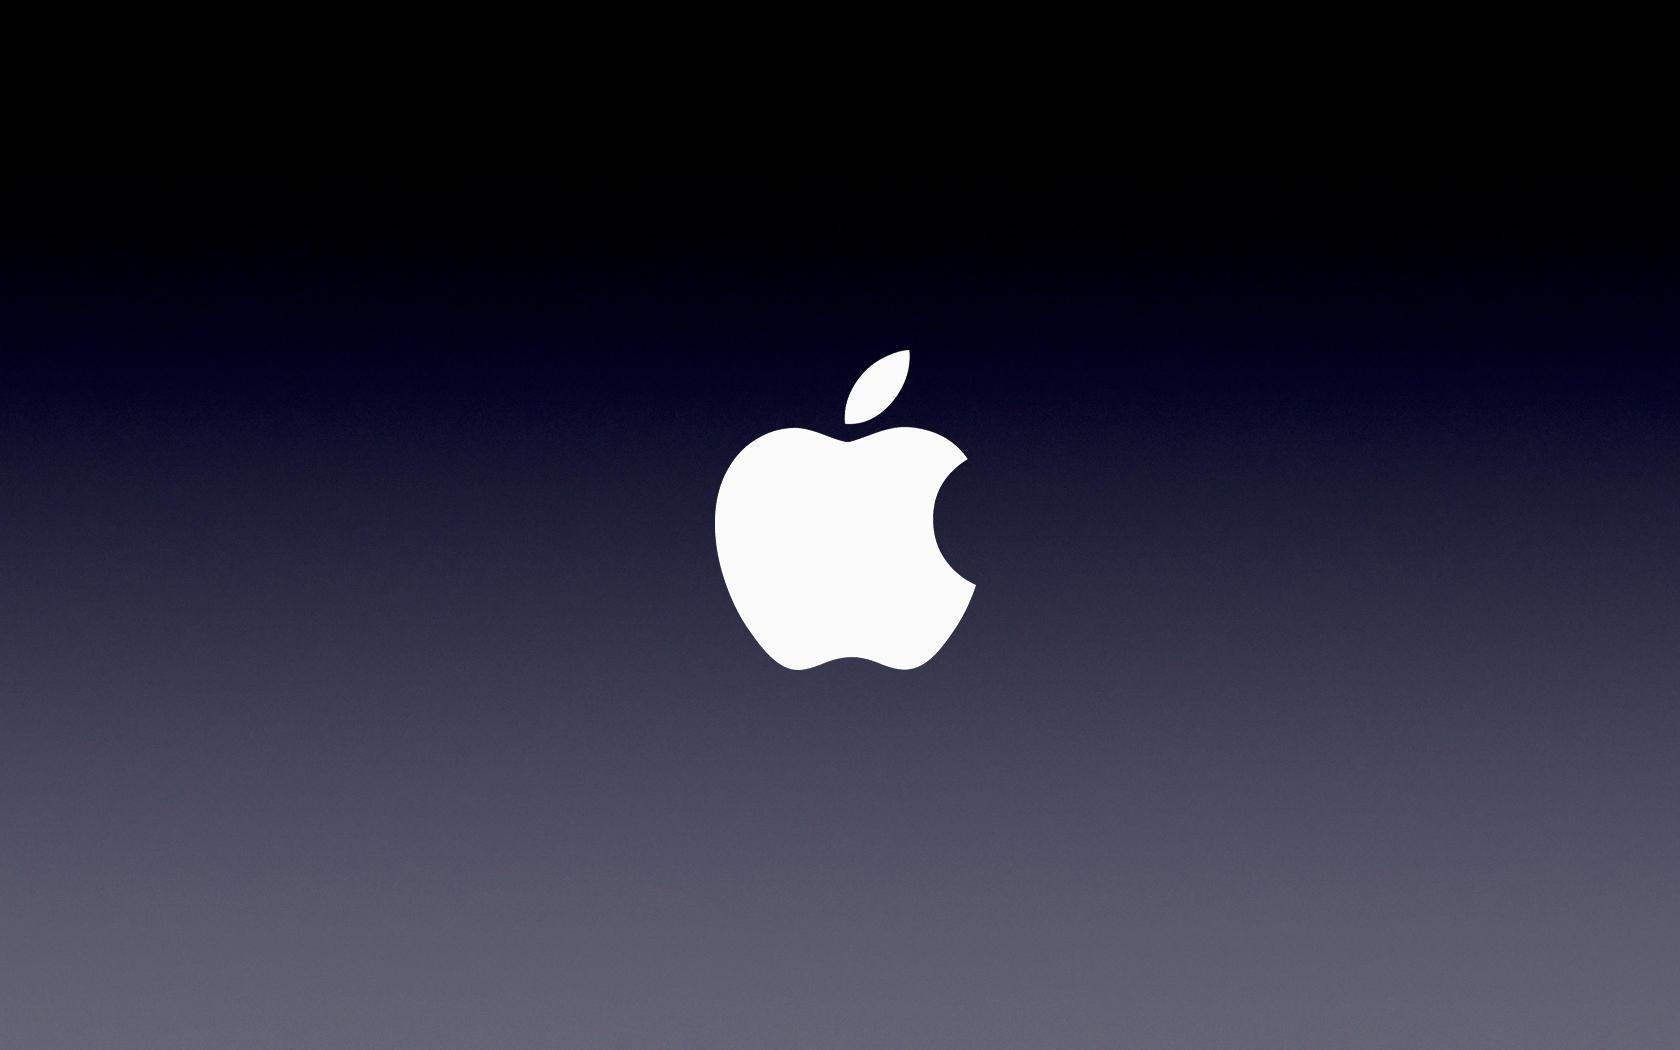 Apple keynote wallpapers by igabapple on deviantart apple keynote wallpapers by igabapple apple keynote wallpapers by igabapple toneelgroepblik Gallery